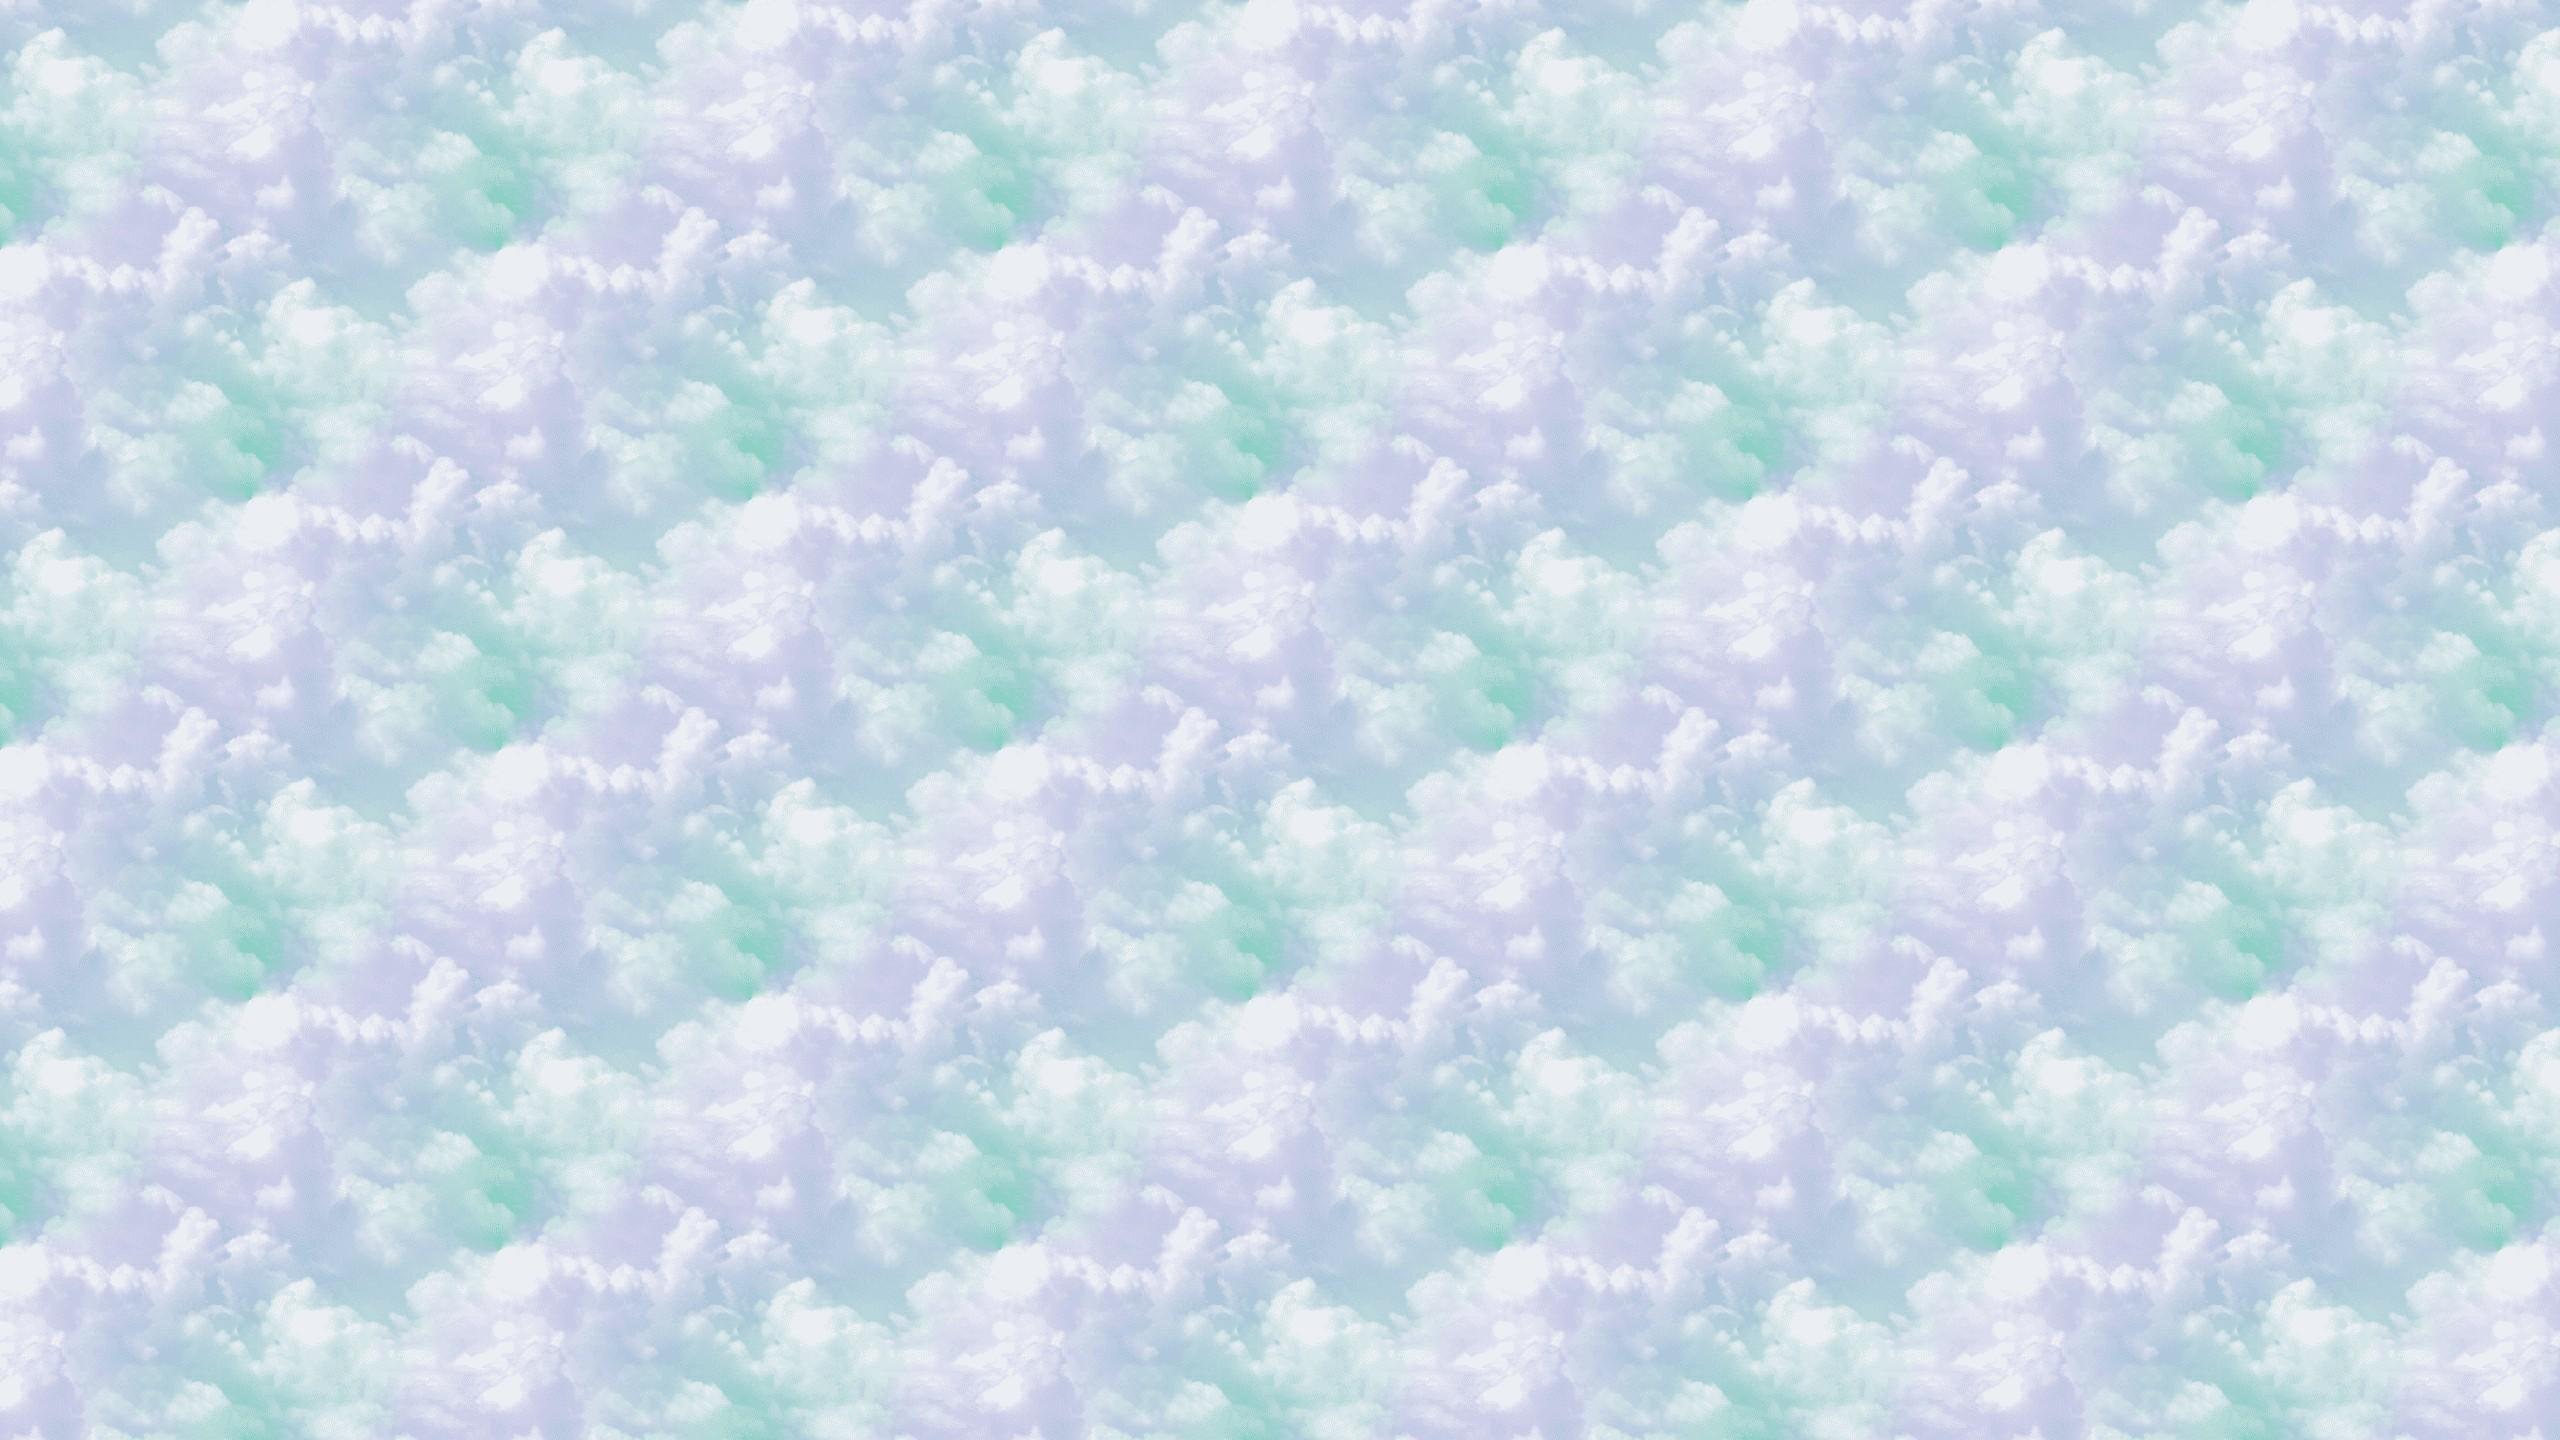 2560 Wallpaper 1440 Aesthetic X Tumblr